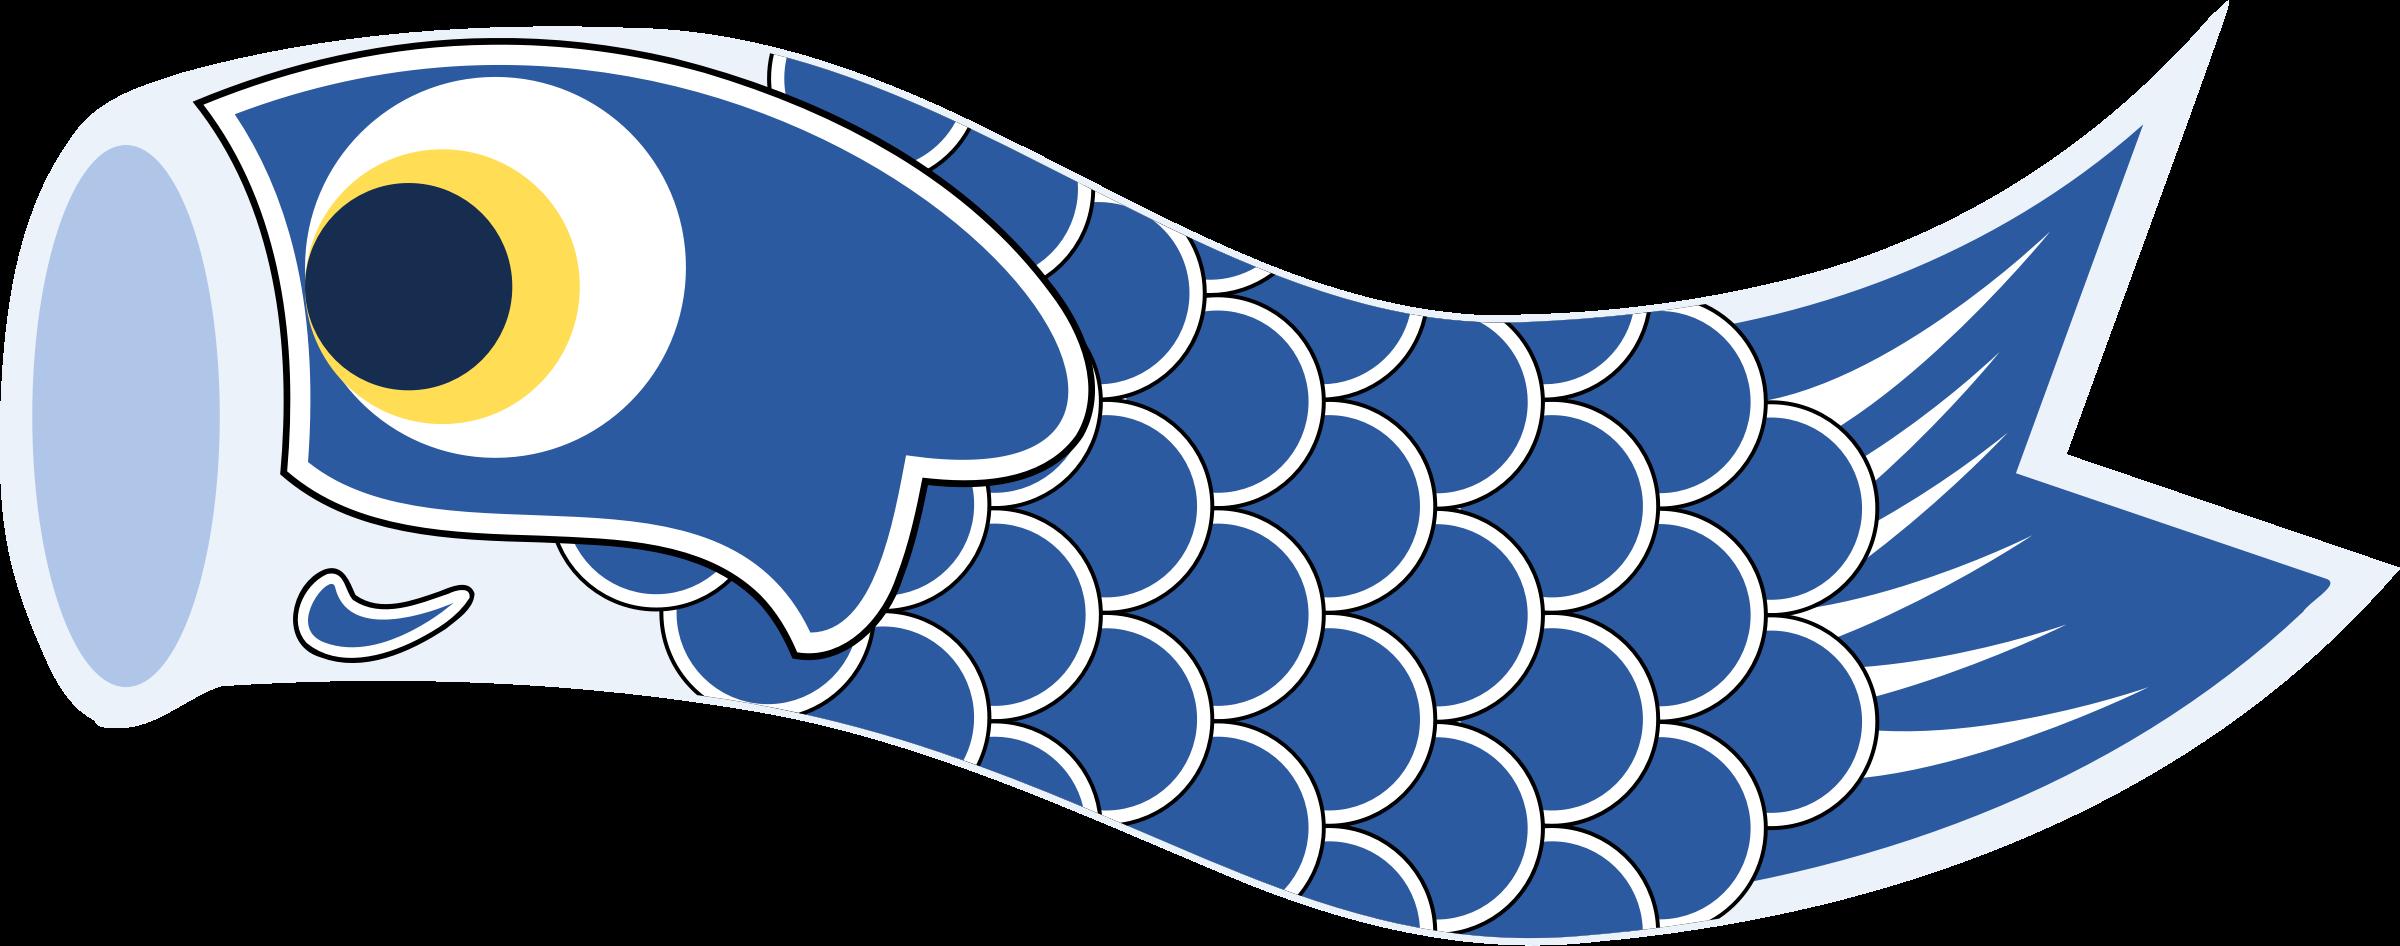 Koinobori dark icons png. Streamers clipart light blue